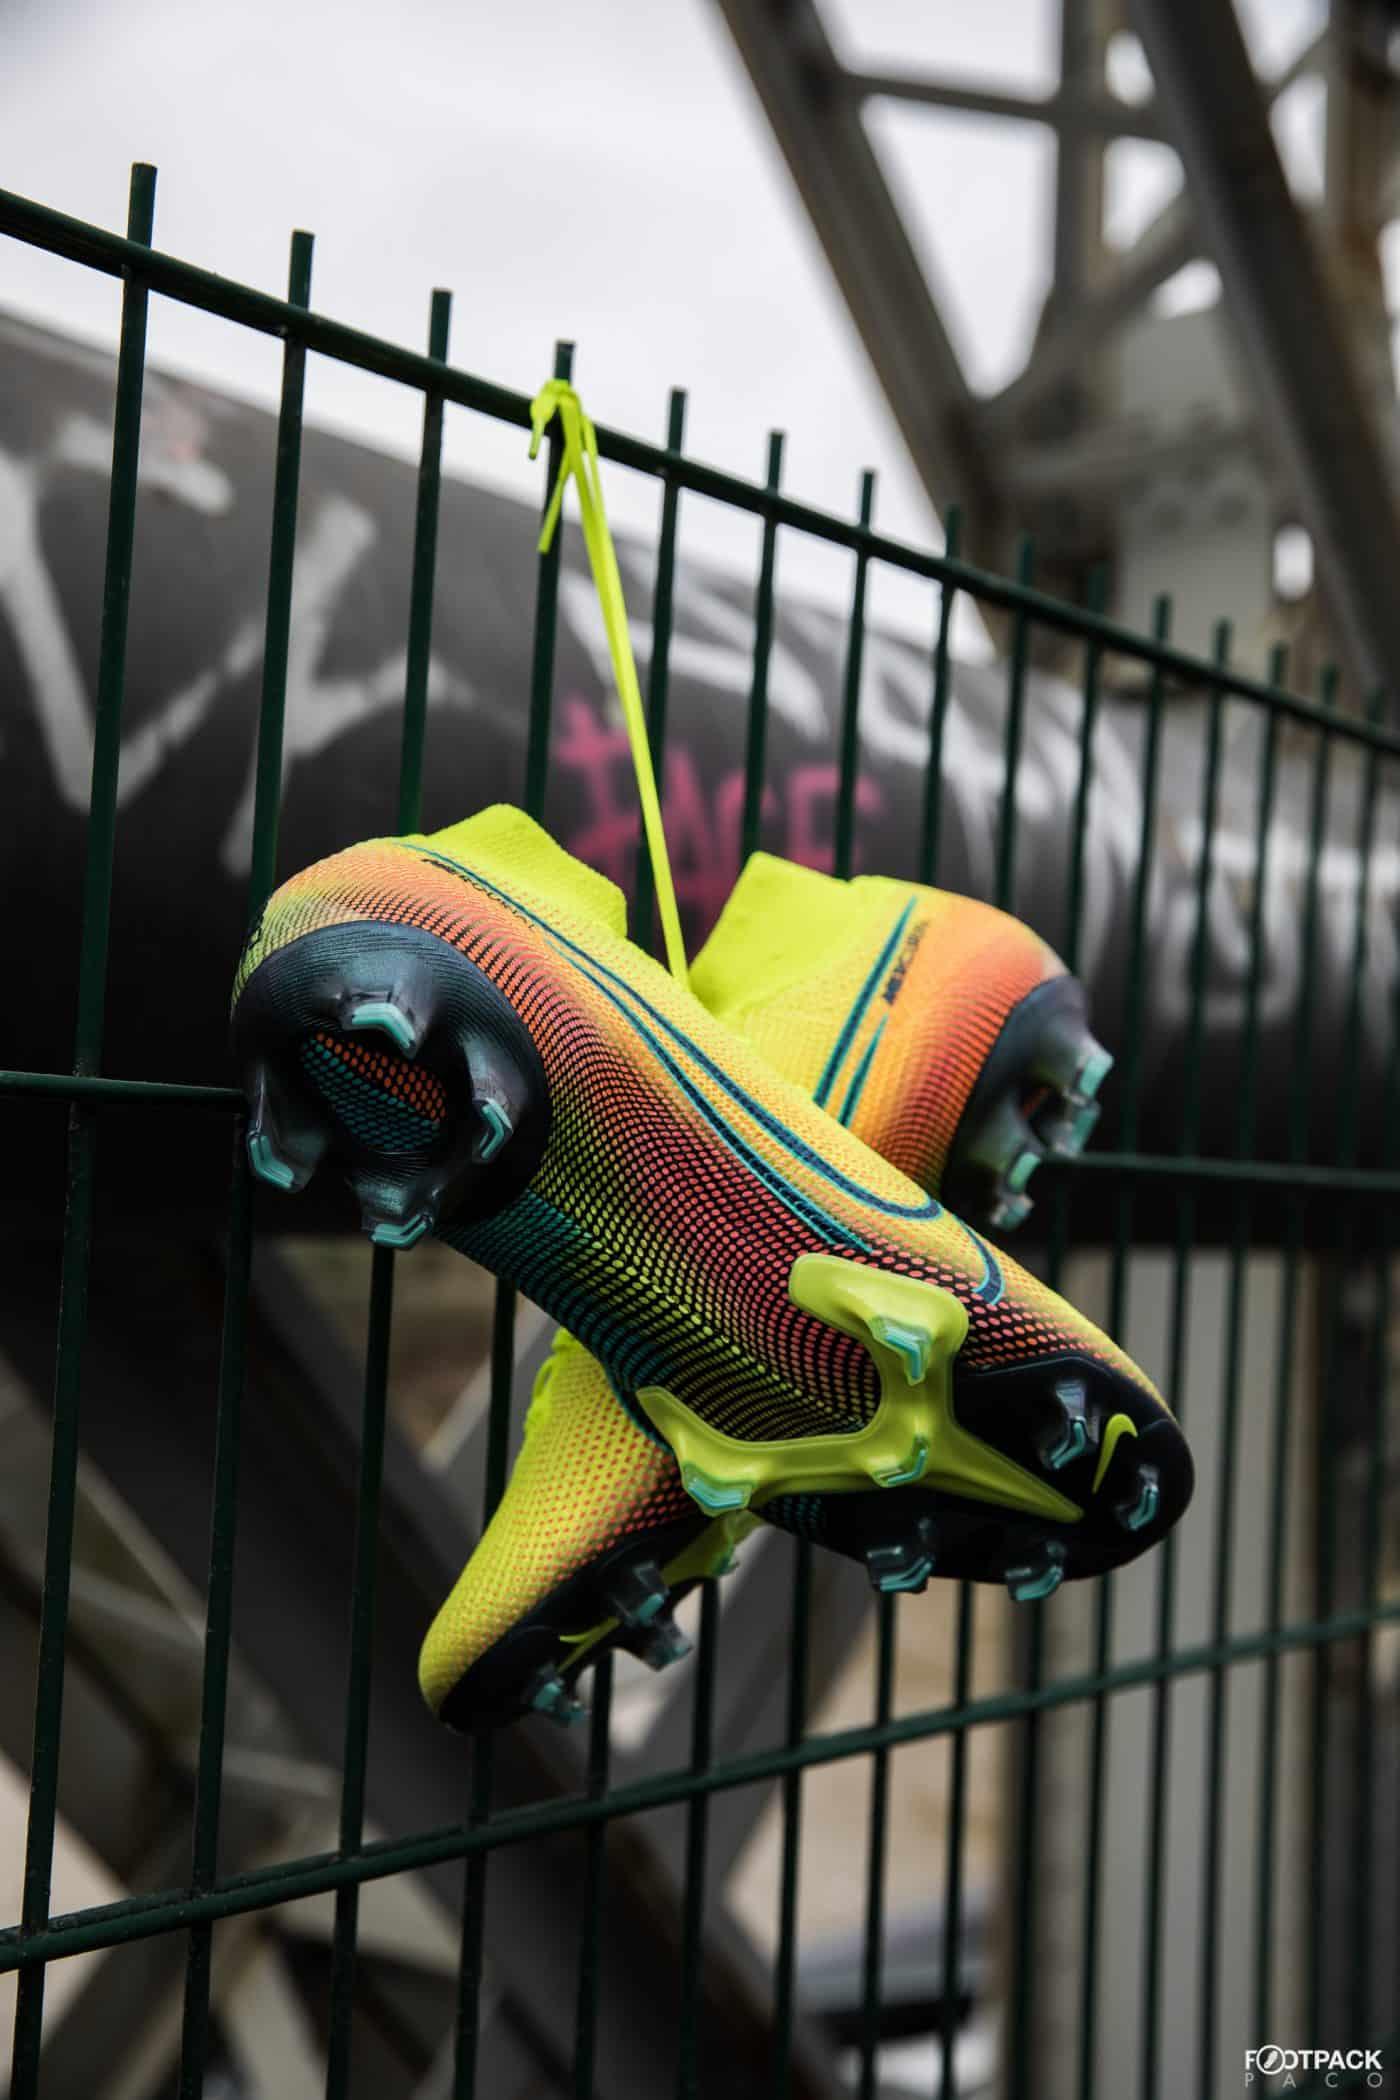 nike-mercurial-dream-speed-002-mbappe-cristiano-ronaldo-footpack-8